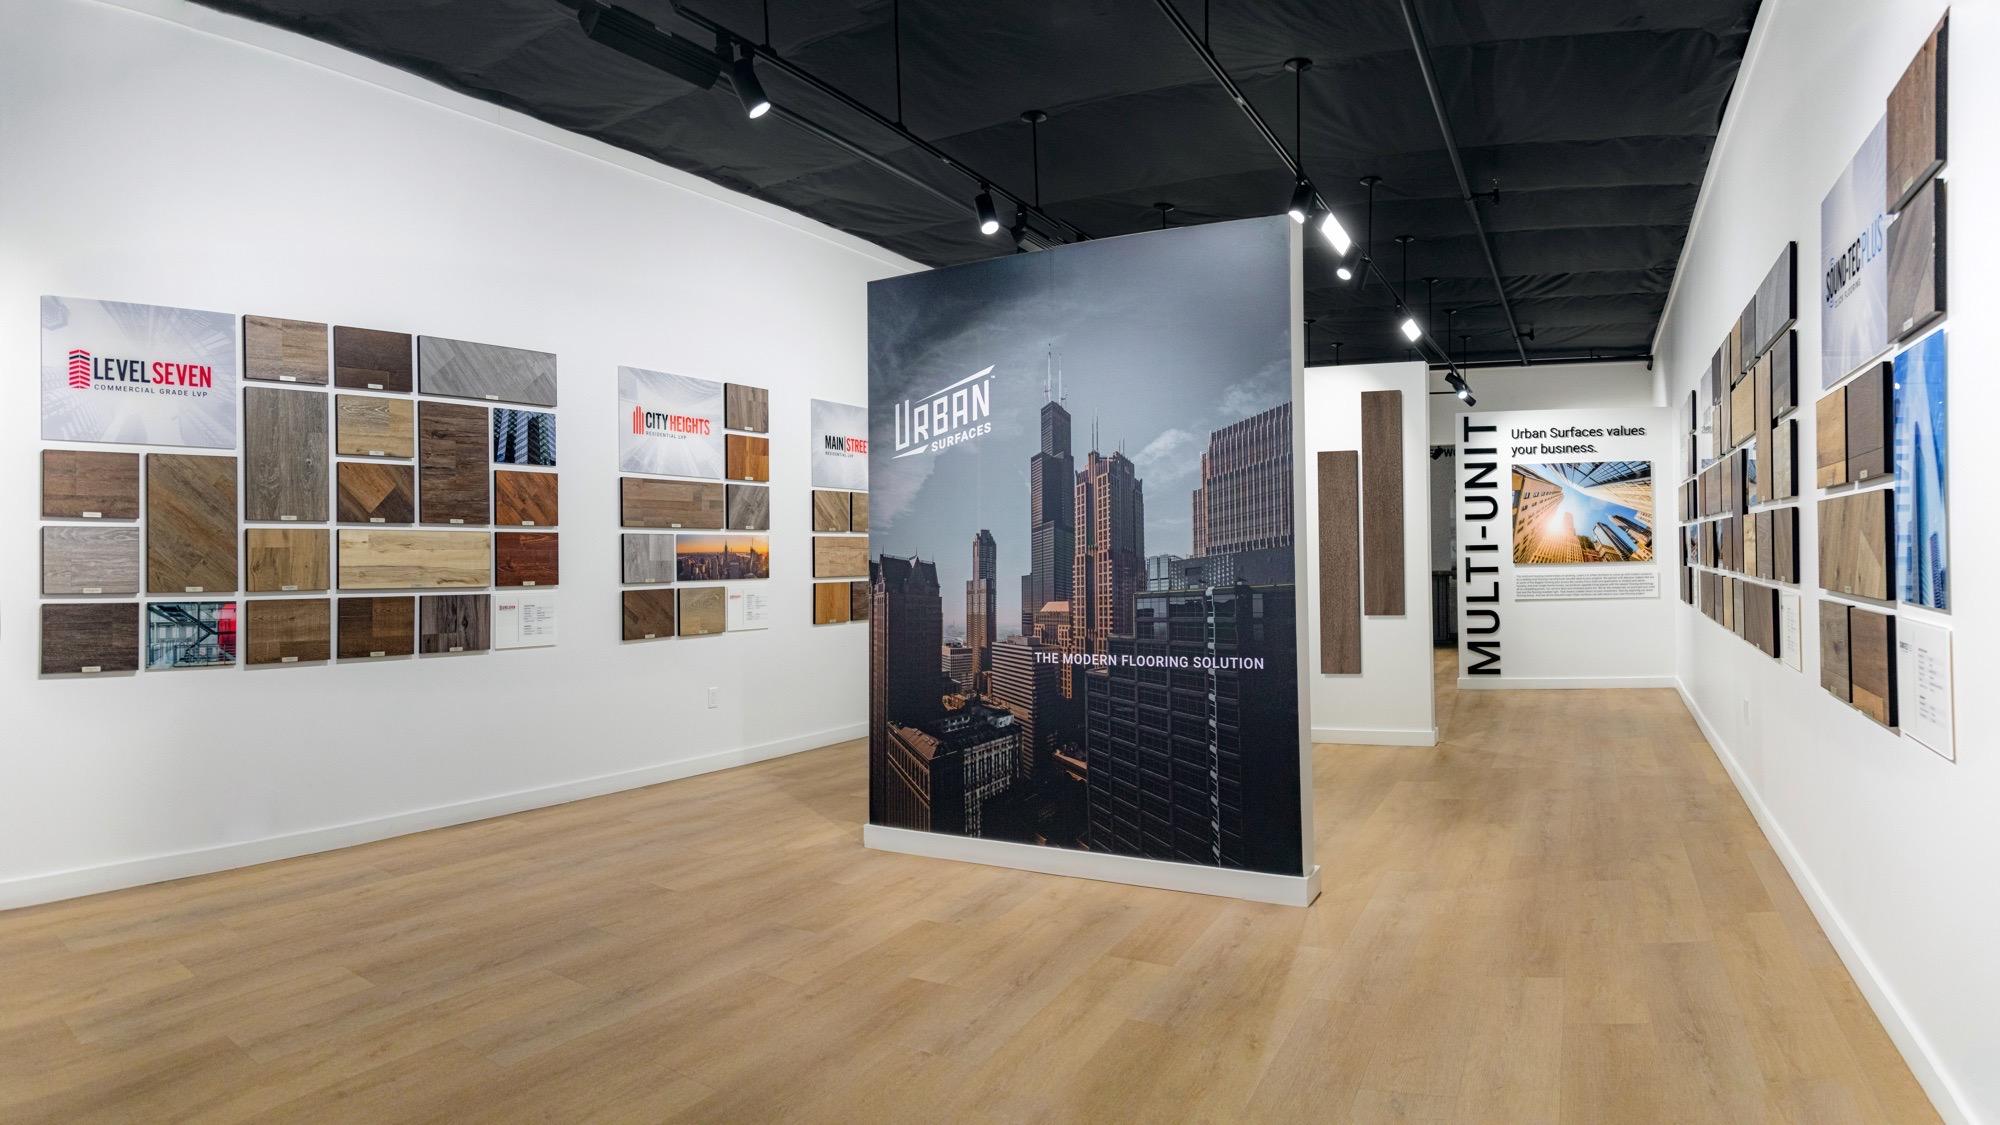 Museum Style Displays Of Vinyl Flooring By Urban Surfaces